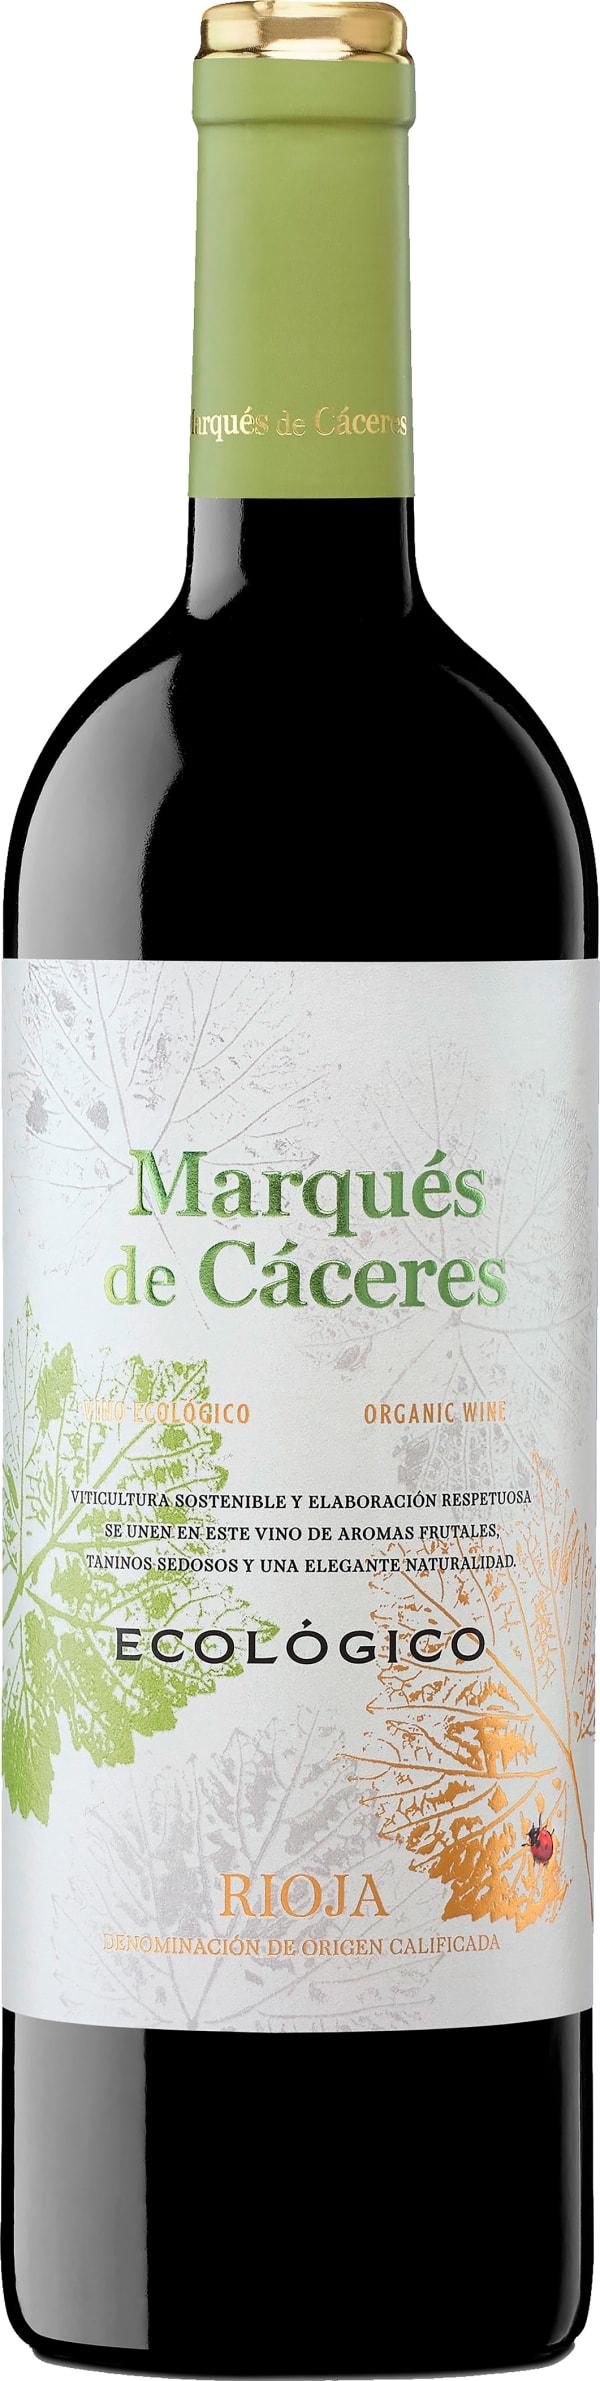 Marqués de Cáceres Vino Ecológico  2018